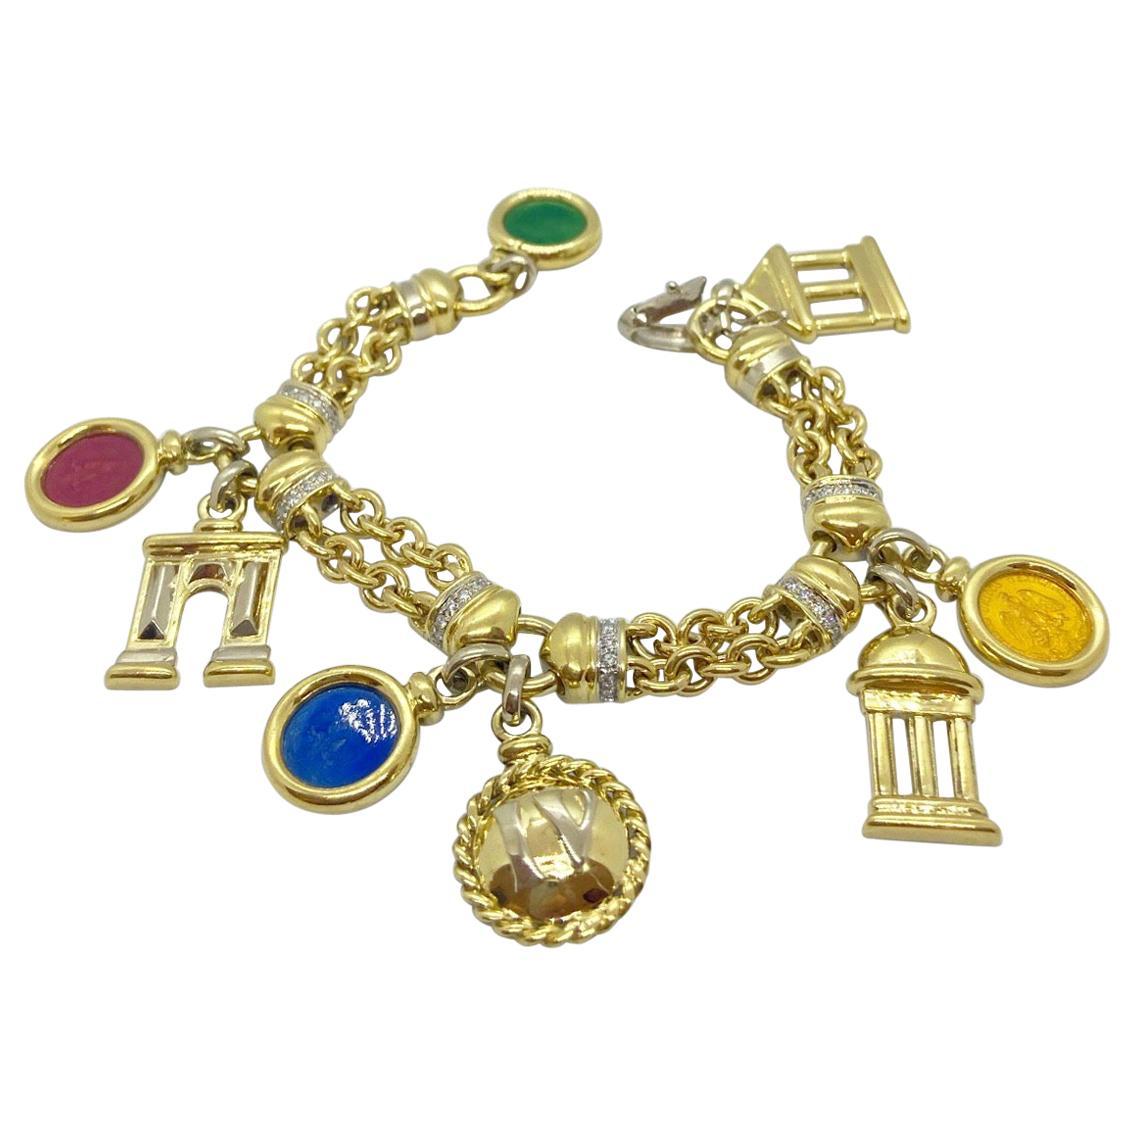 Roberto Legnazzi 18KT Yellow Gold, Travel Charm Bracelet with Enamel & Diamonds